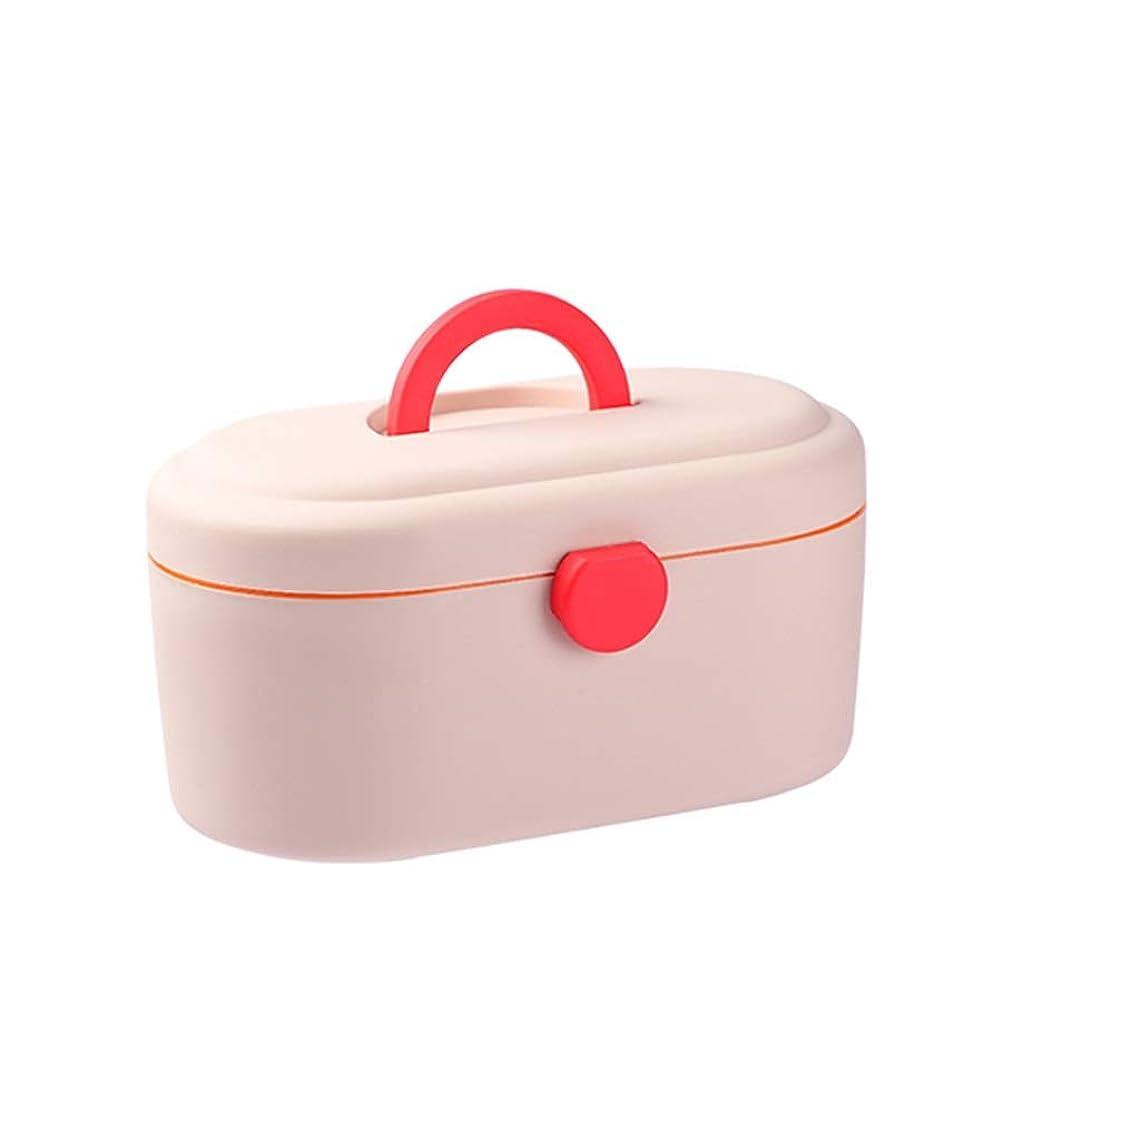 SGLI 家庭用薬箱、大容量のプラスチック製の携帯用薬用収納ボックス、家庭用多層救急箱 (Color : Pink)